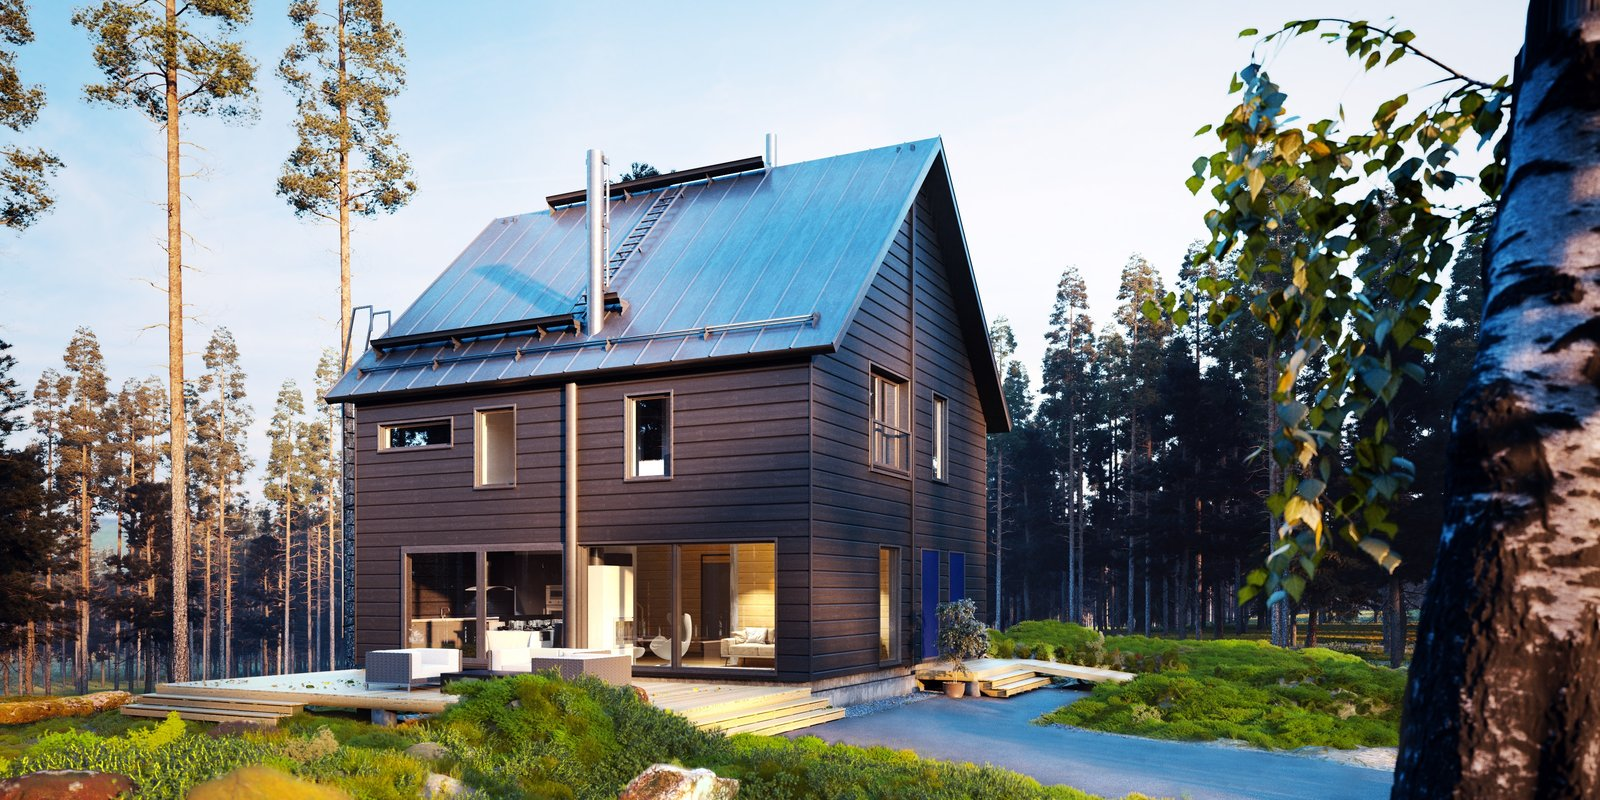 Honka Ink prefab kit log cabin